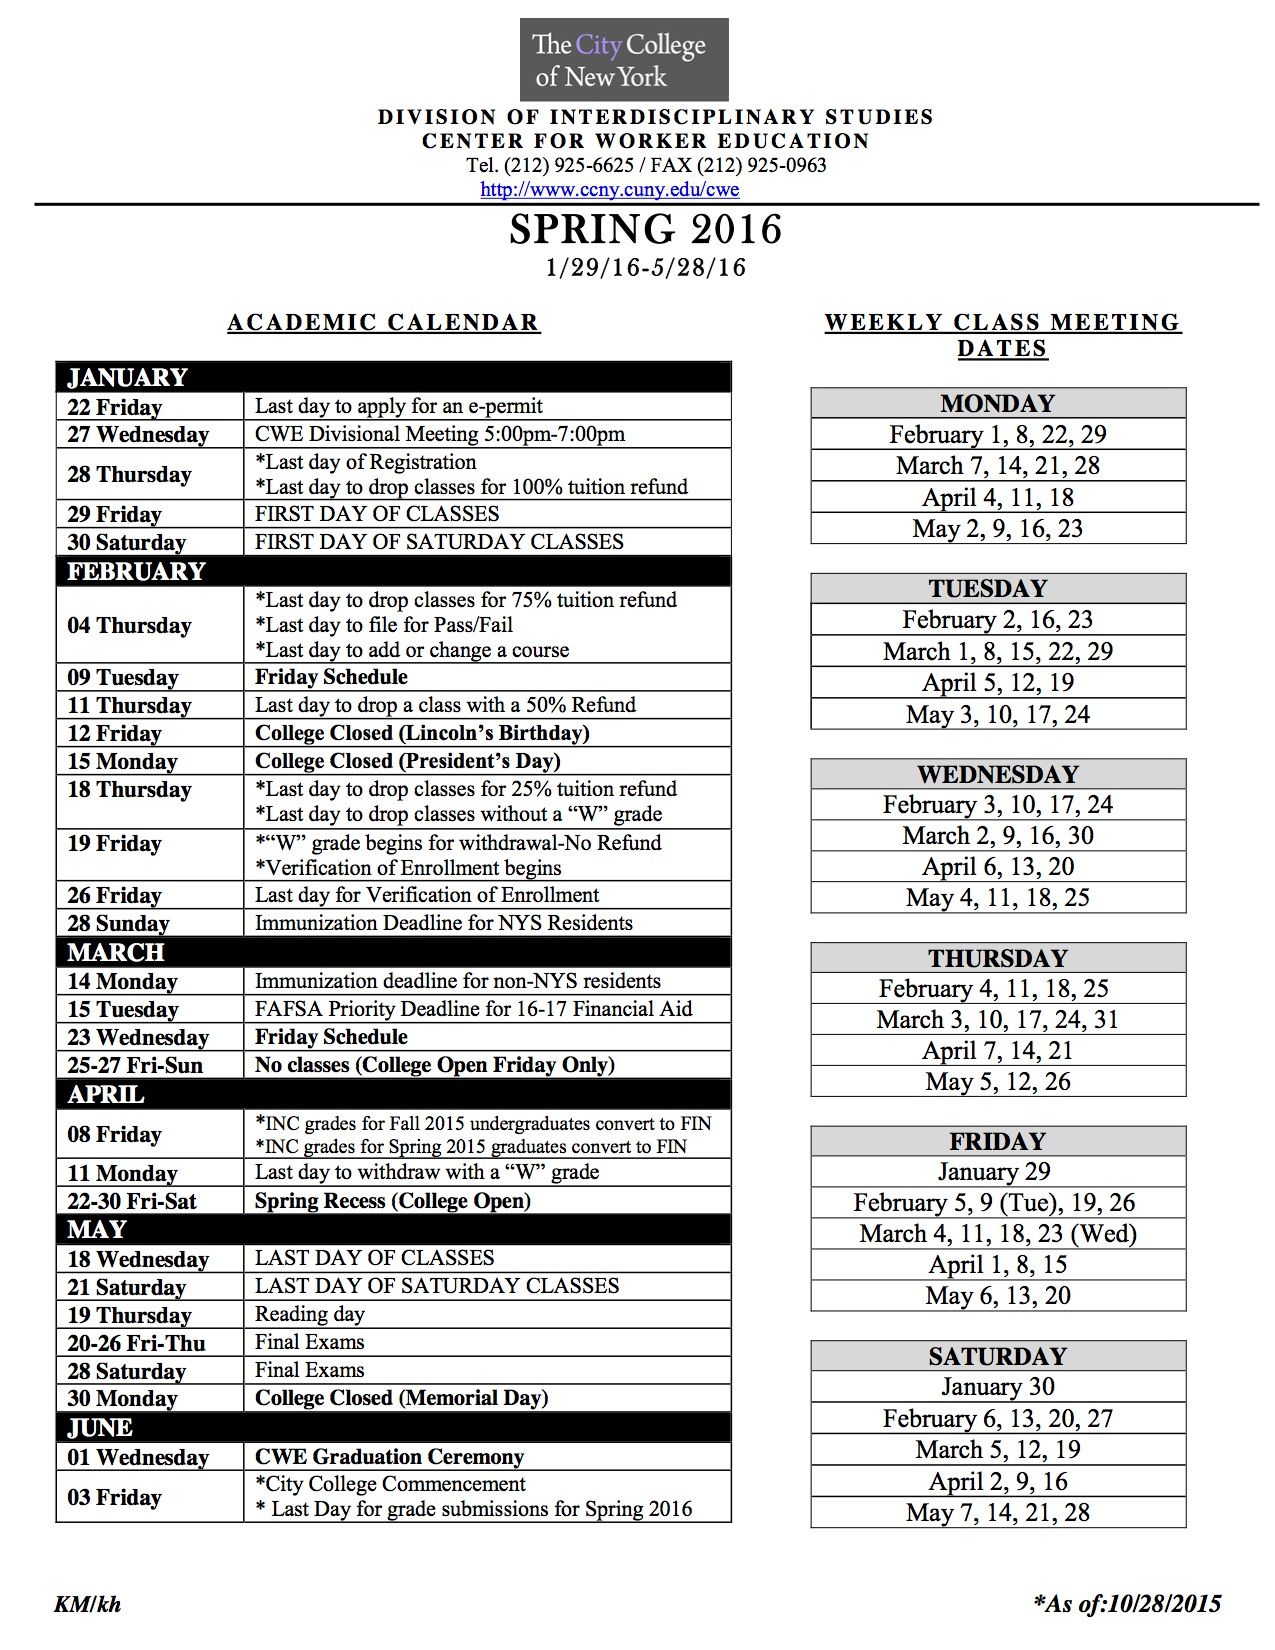 How To Print A Holiday Calendar From Outlook | Printable Calendar 2020-2021 with Merced City Schools Calendar